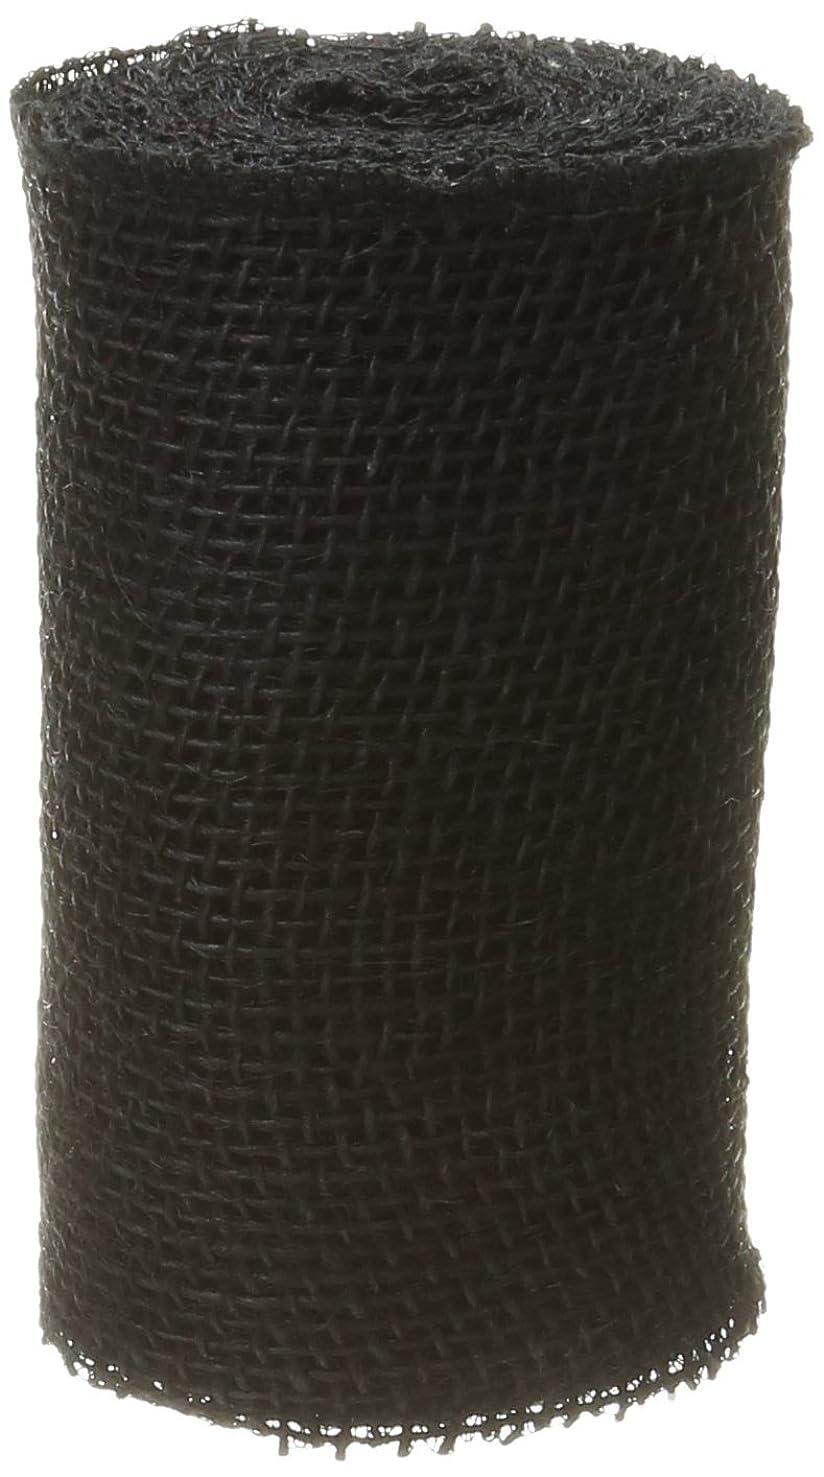 DARICE 2914-043240gm Burlap Ribbon, 6-Inch by 5-Yard, Black